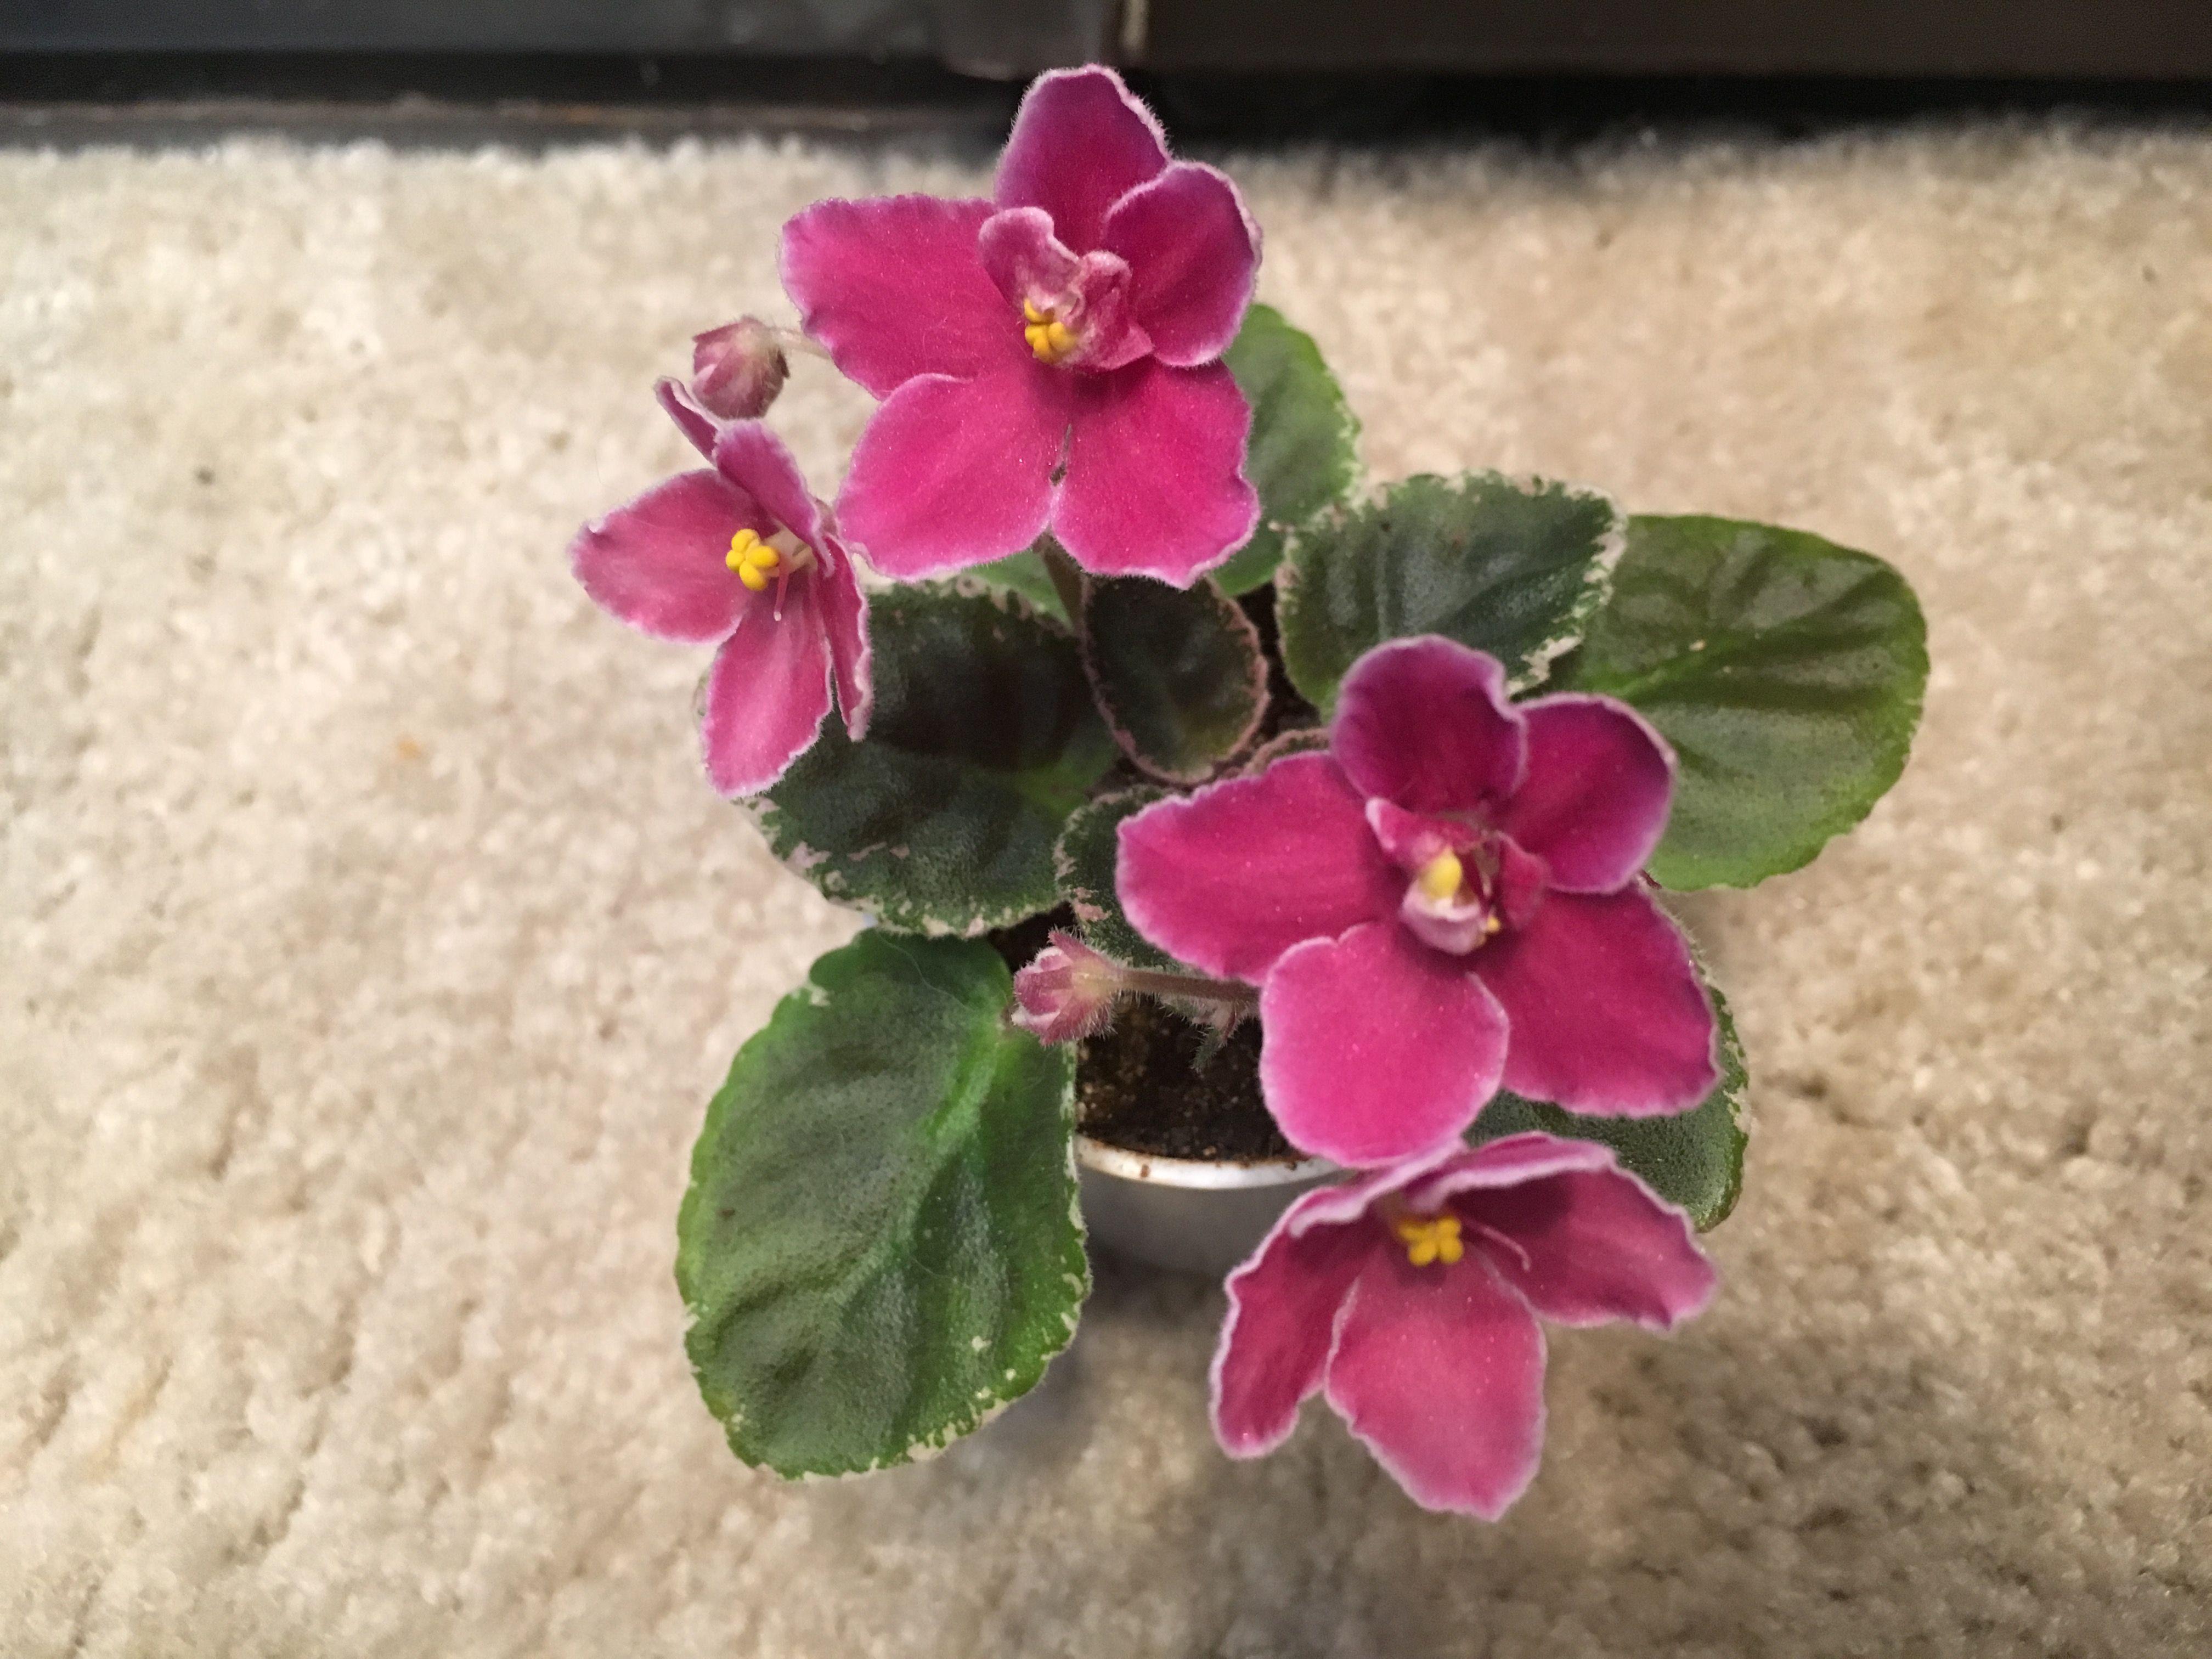 Pin by Karen Lohnes on My Violets African violets